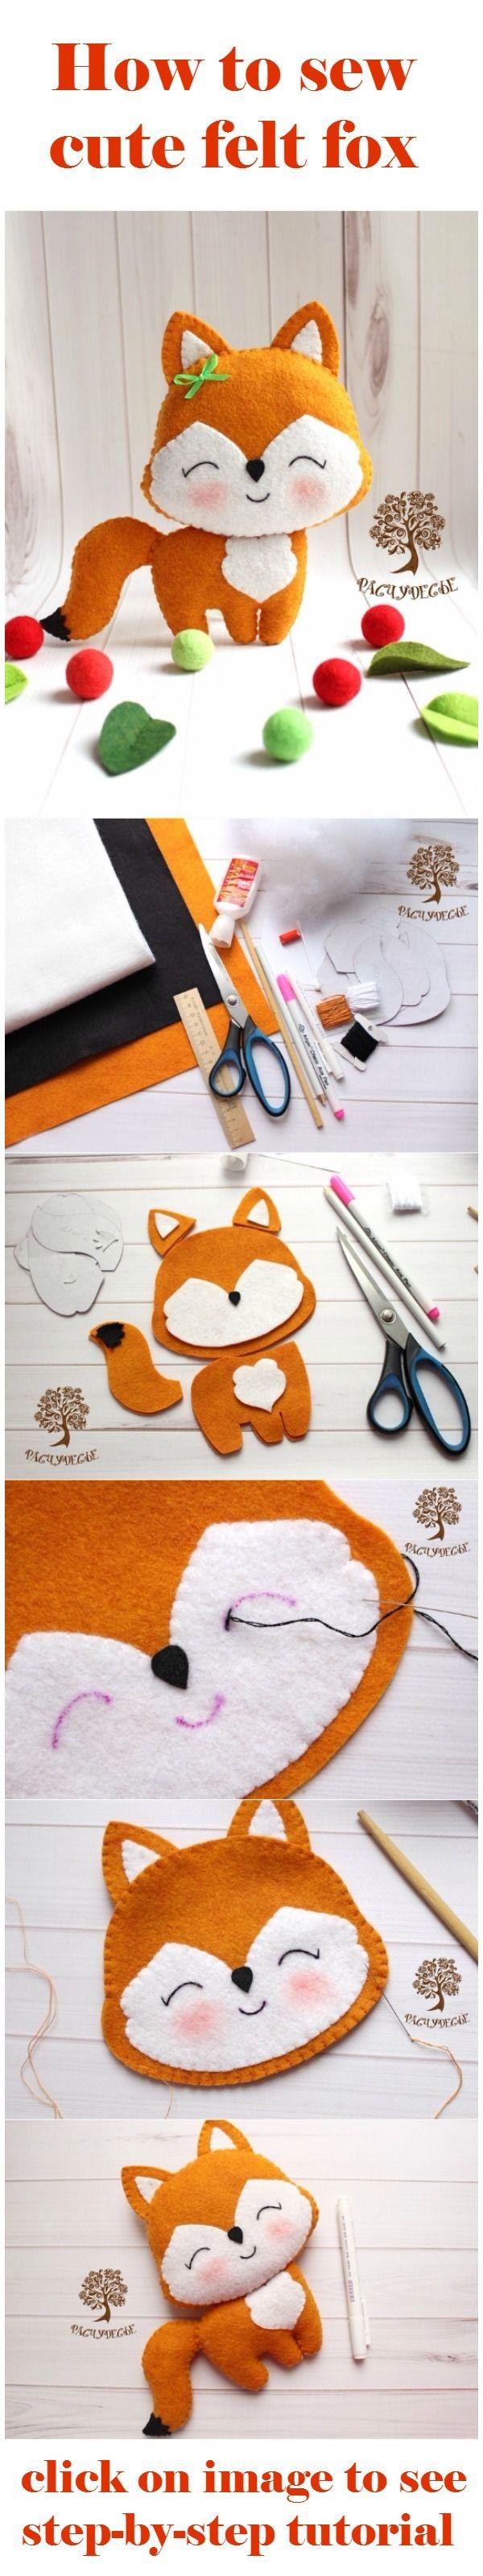 How to sew cute felt fox | DIY Fun Tips